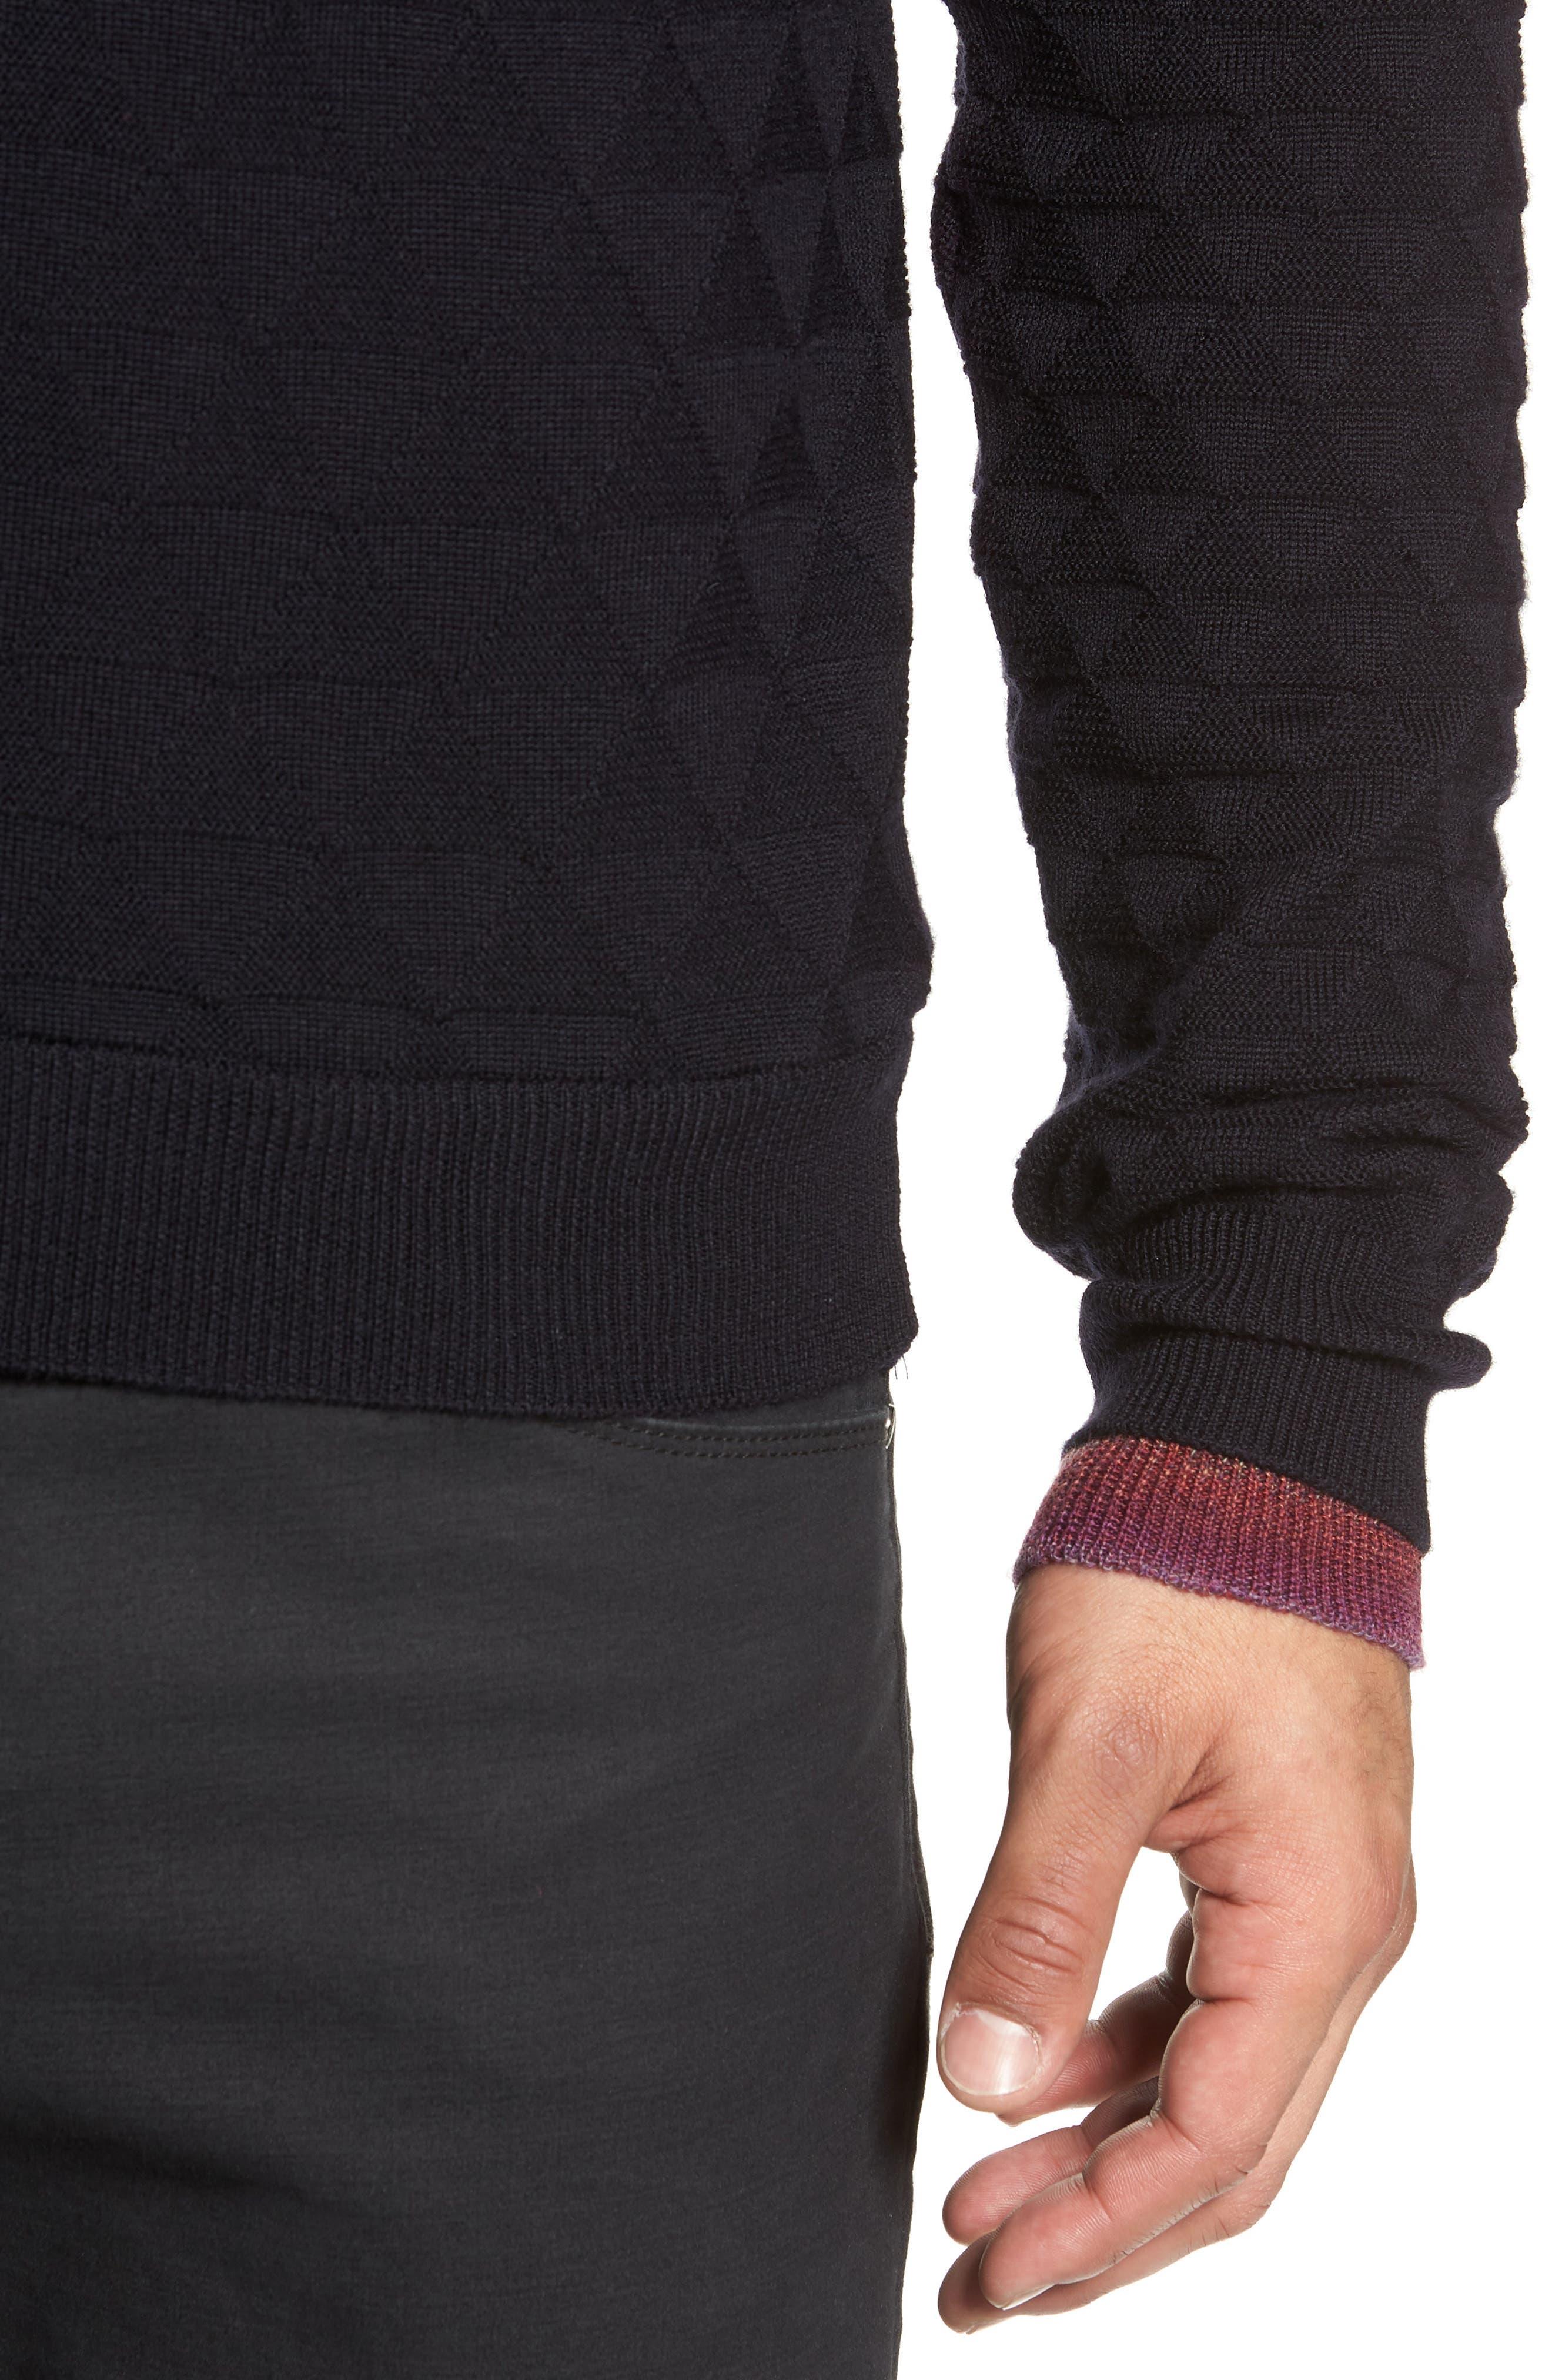 Blackburn Classic Fit Sweater,                             Alternate thumbnail 4, color,                             BLACK